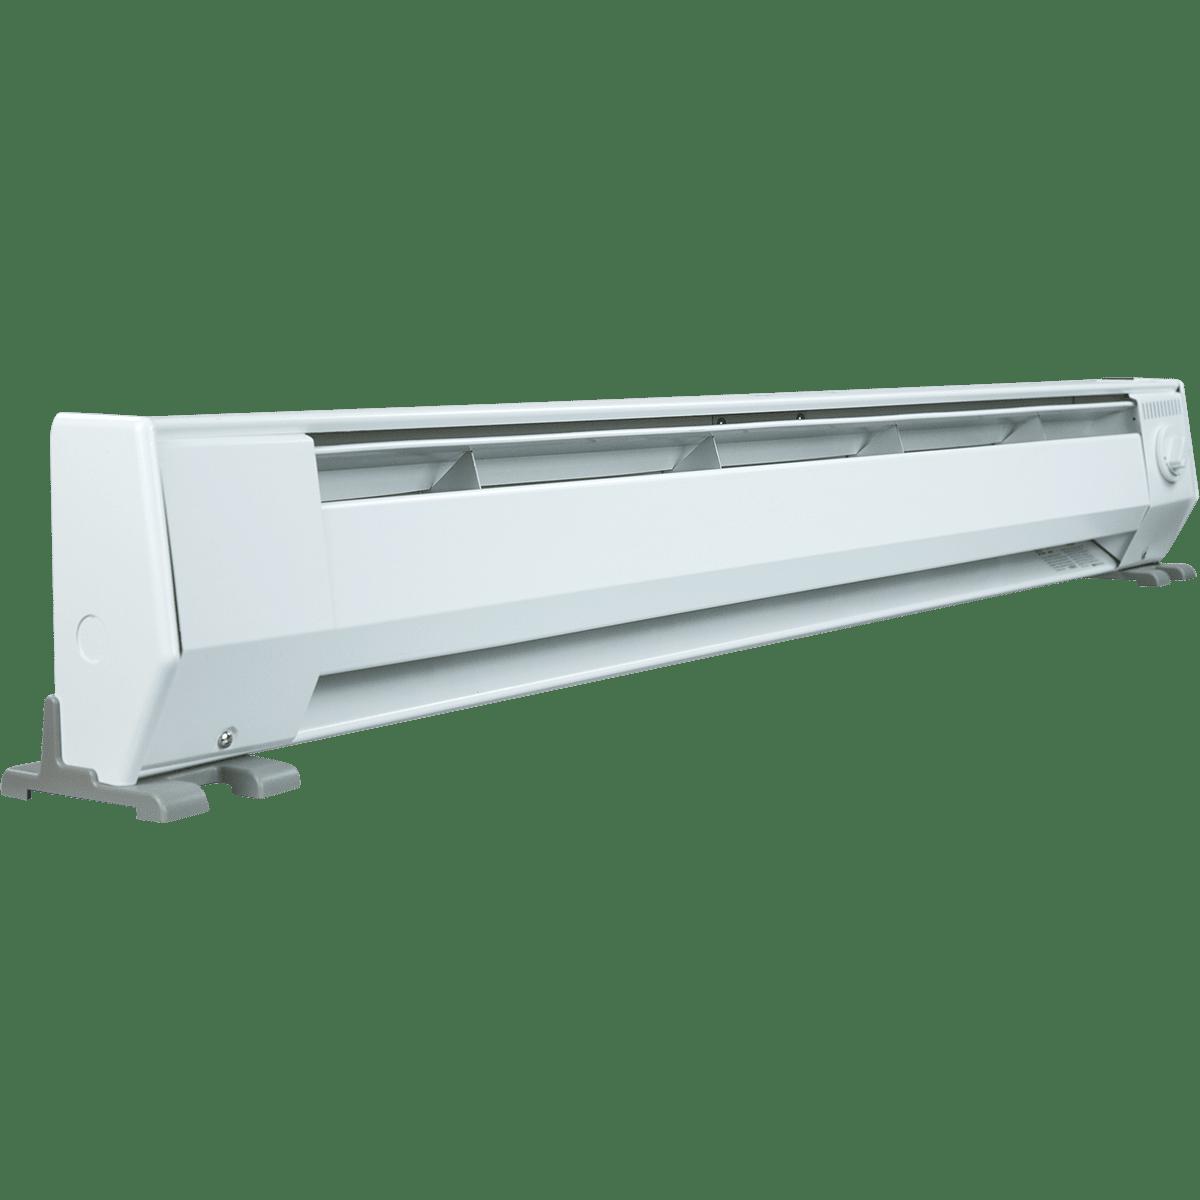 King Electric Kp1210 1000 Watt Portable Baseboard Heater Sylvane For Baseboards Furnaces Radiant Heat